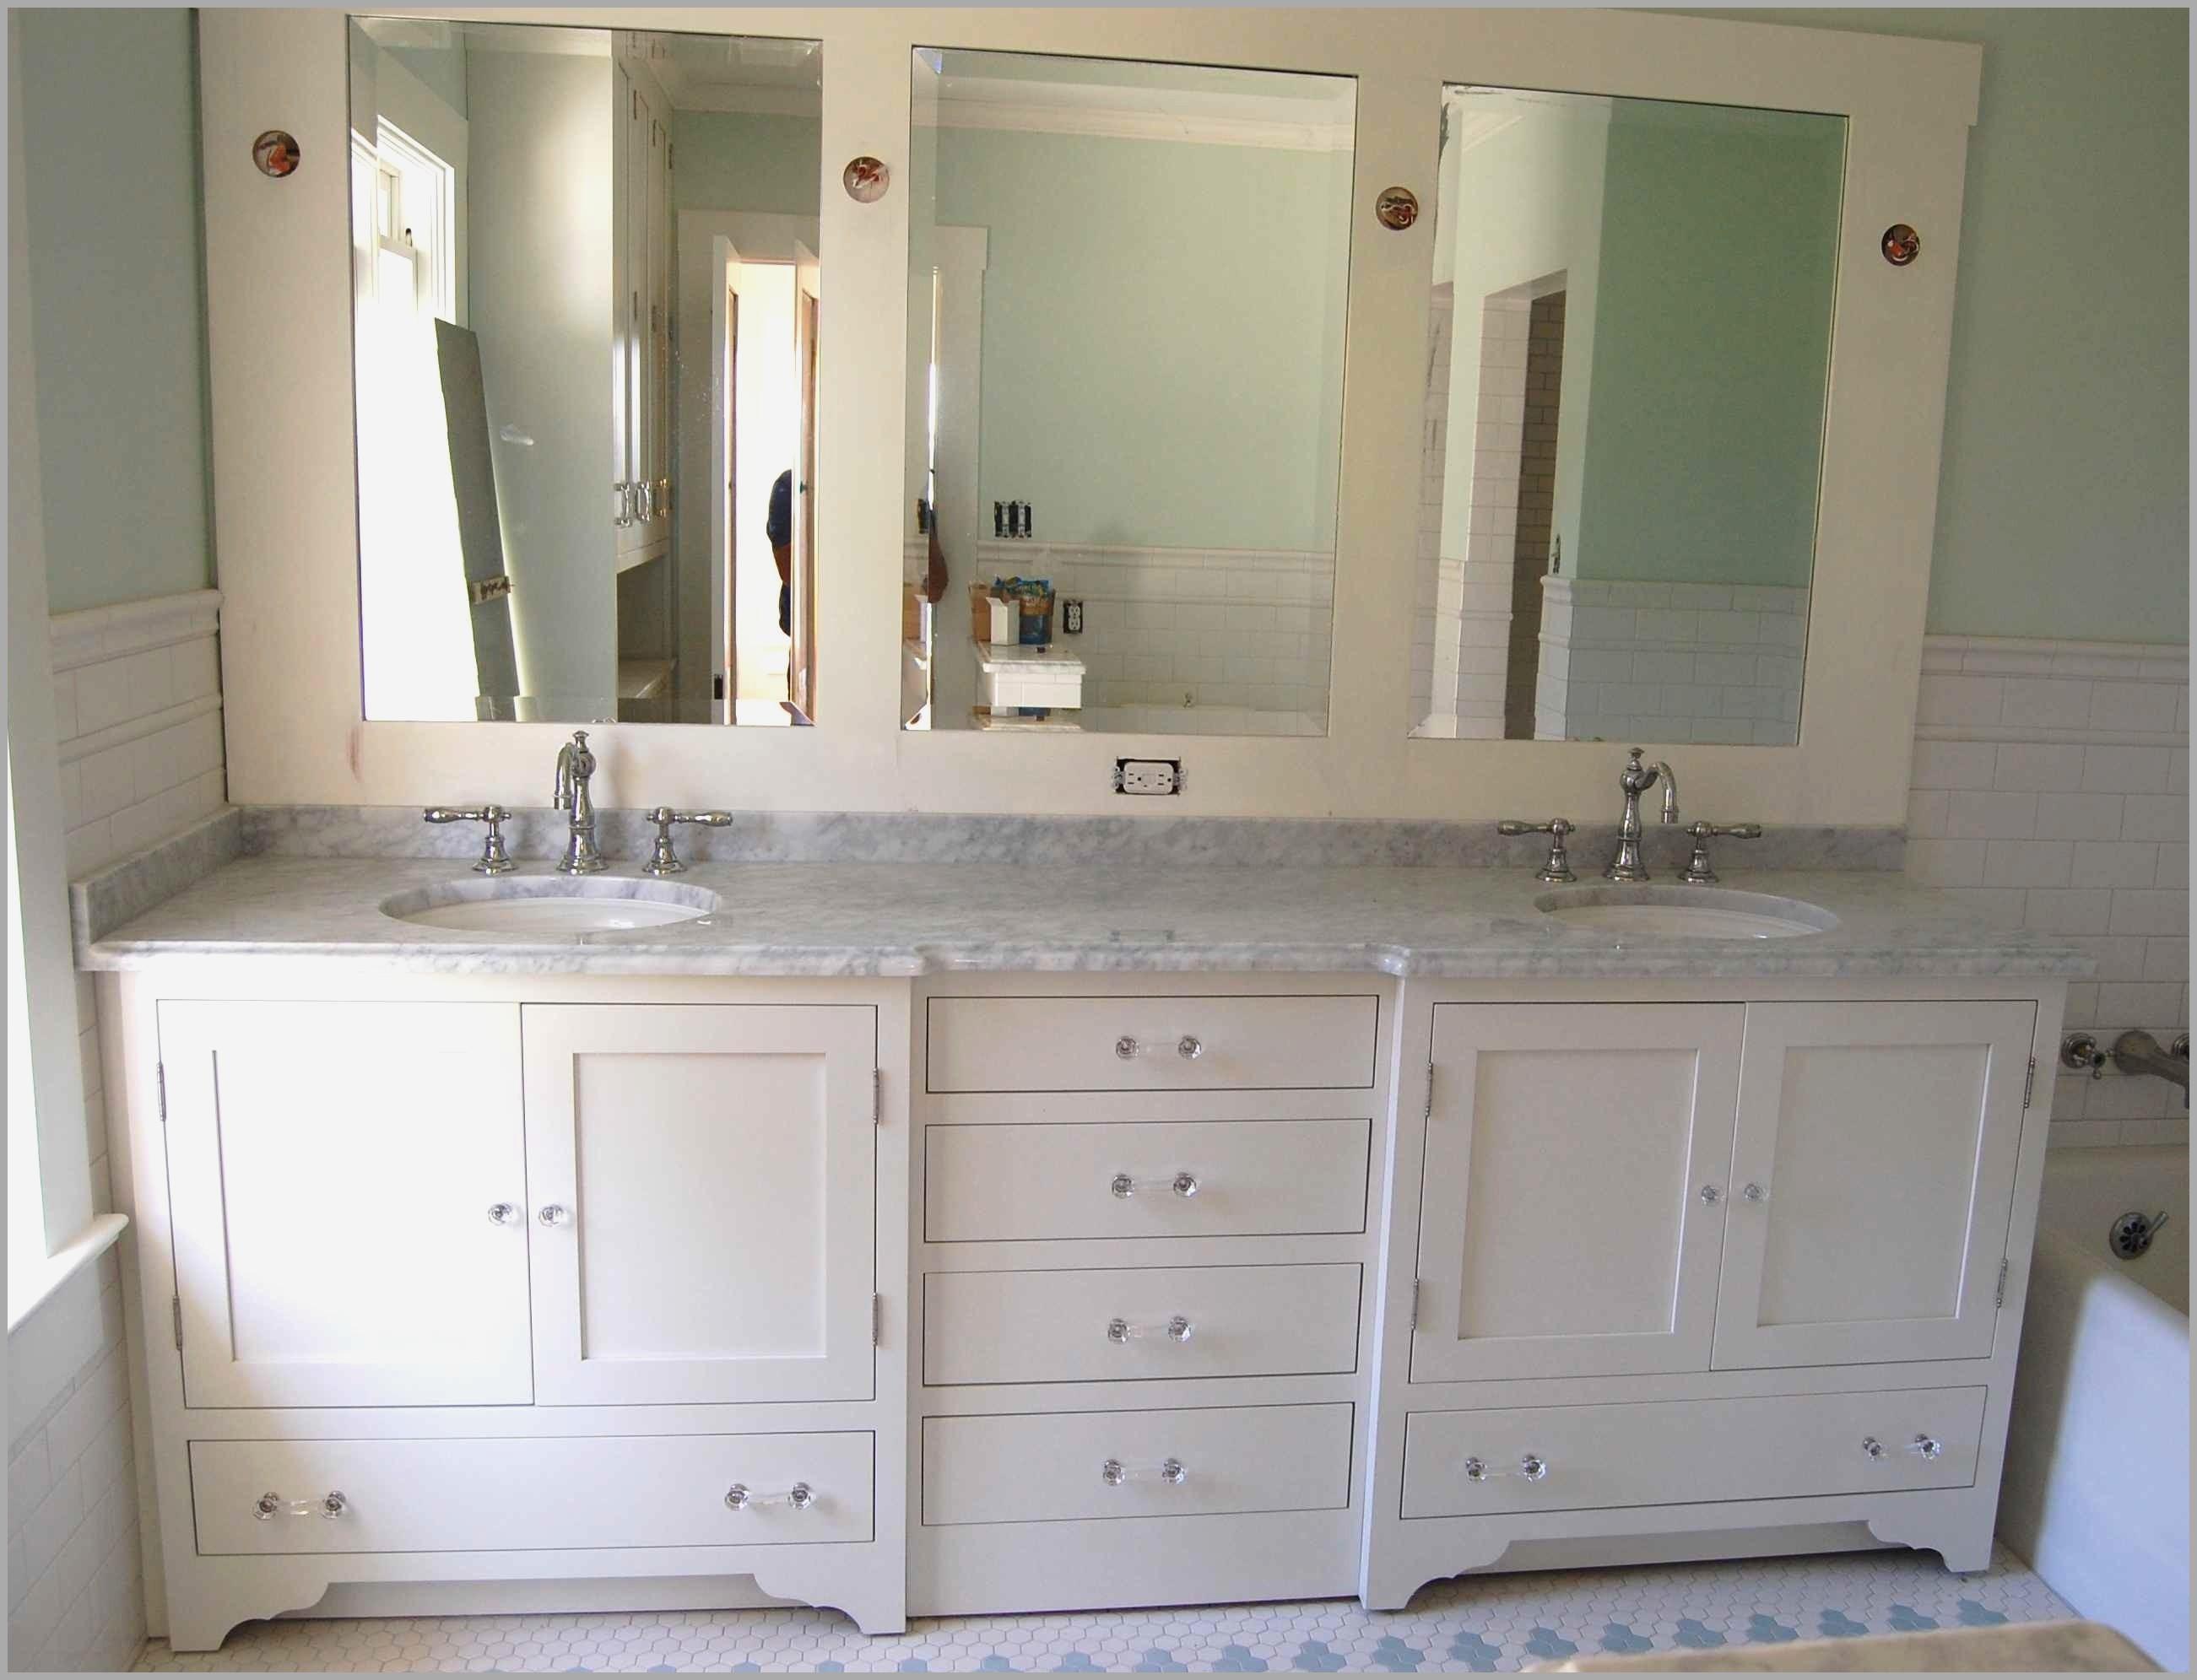 Merveilleux 80 Bathroom Vanity Sensational Cute Inch Bathroom Vanity Decorative Bathroom  Ideas Pattern